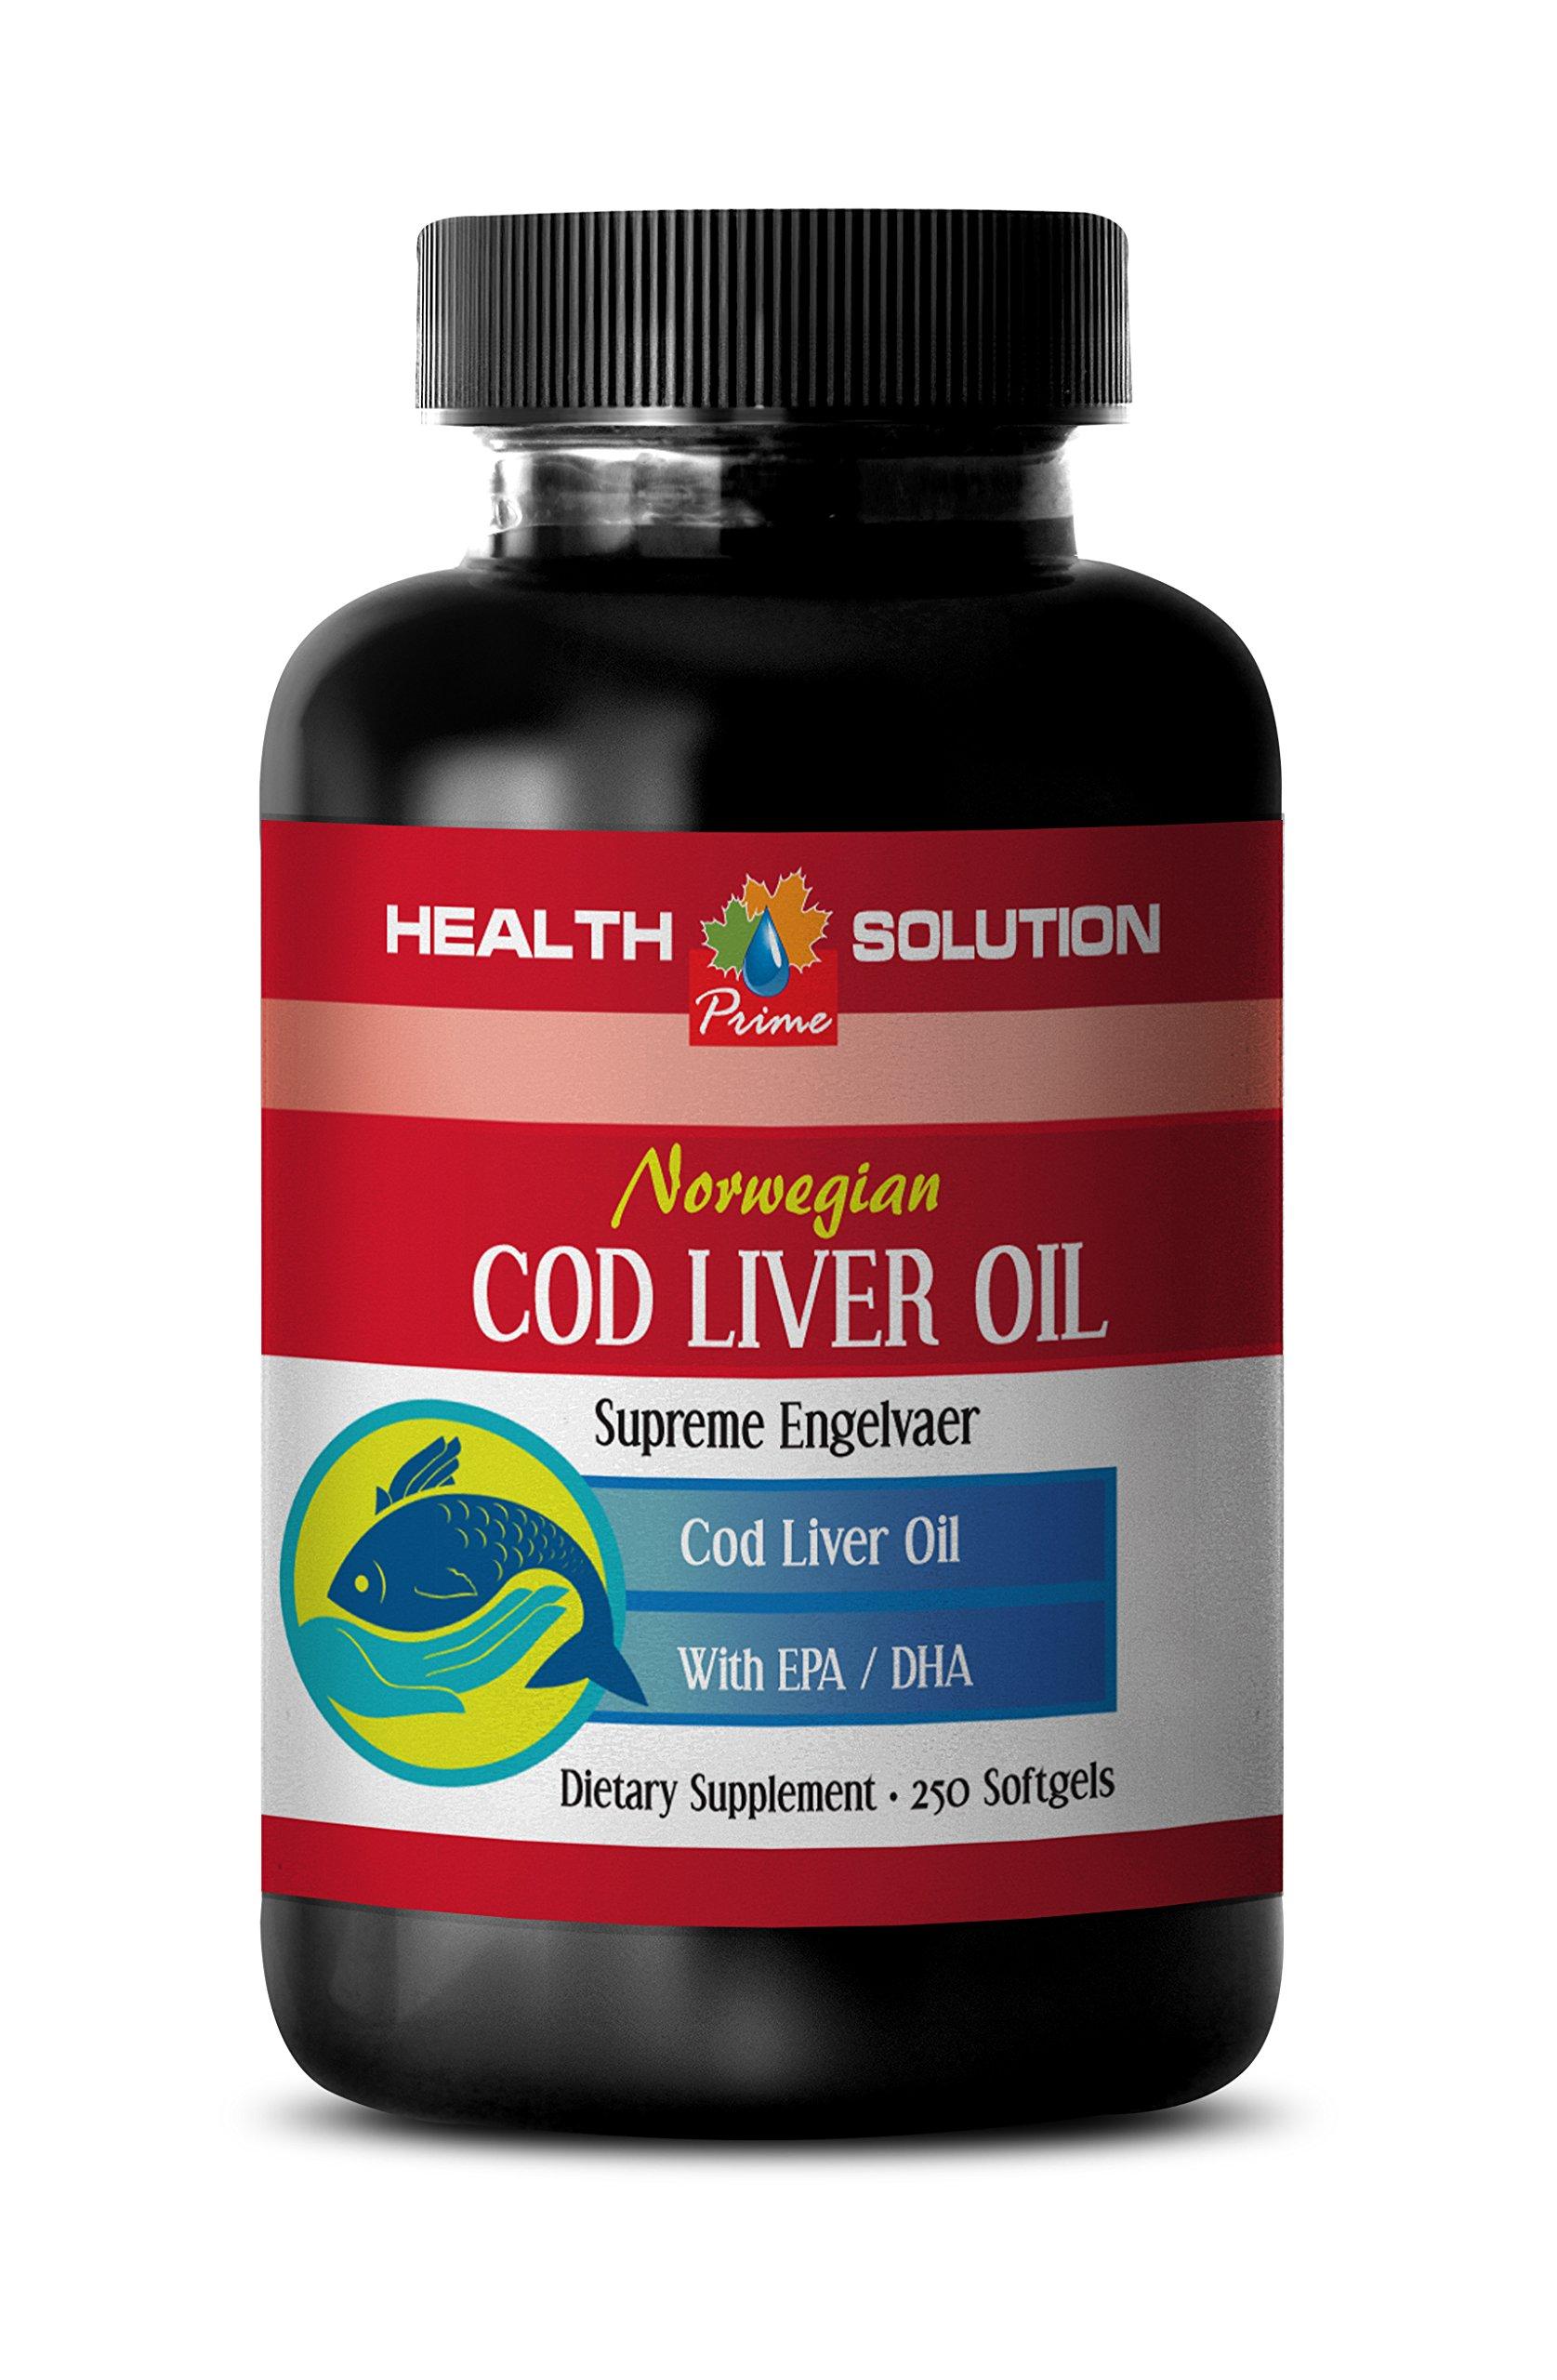 Brain booster - NORWEGIAN COD LIVER OIL with Vitamins A & D3/EPA & DHA - Norwegian fish oil supplement - 1 Bottle 250 Softgels